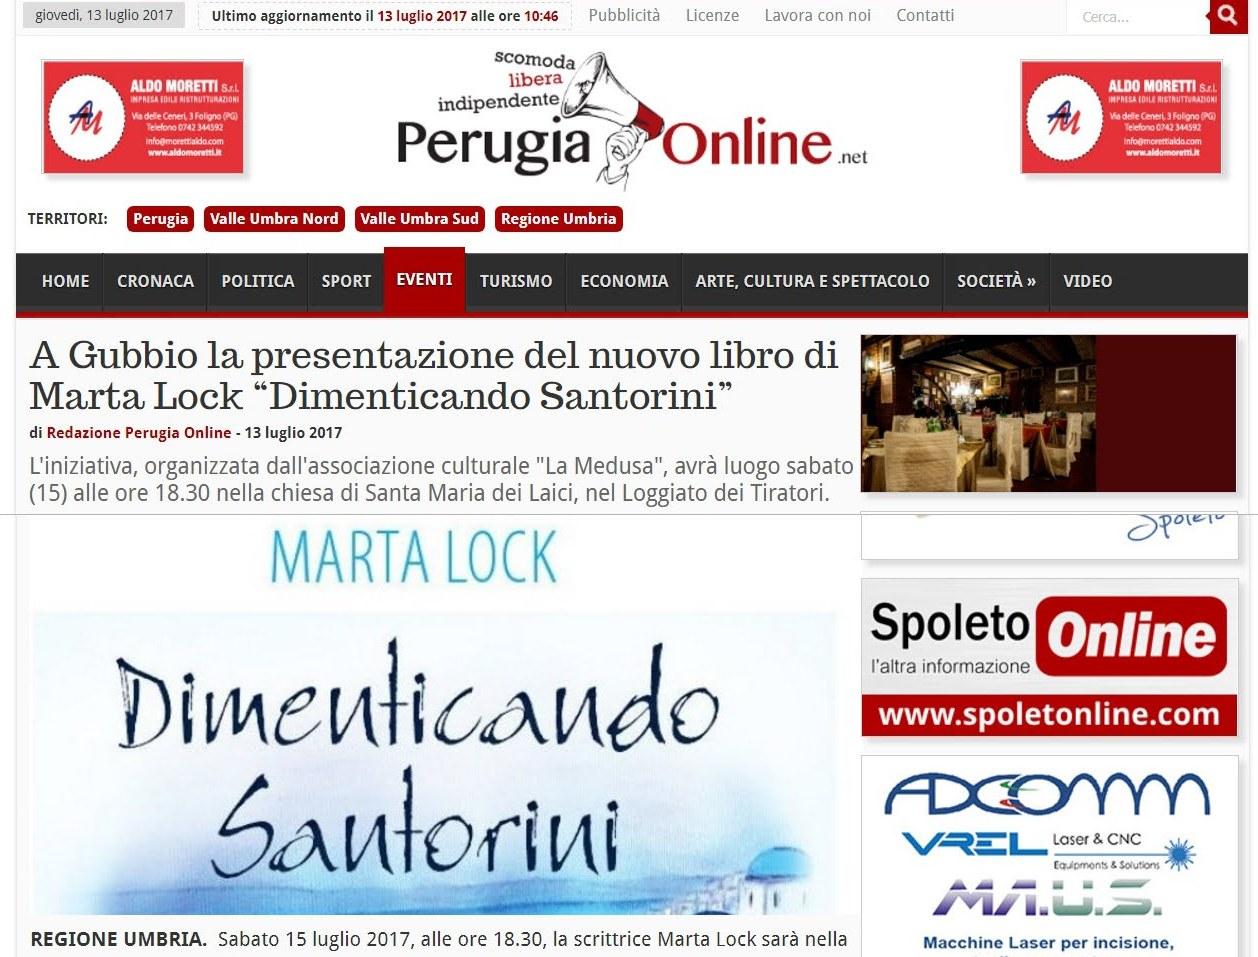 Perugia on line